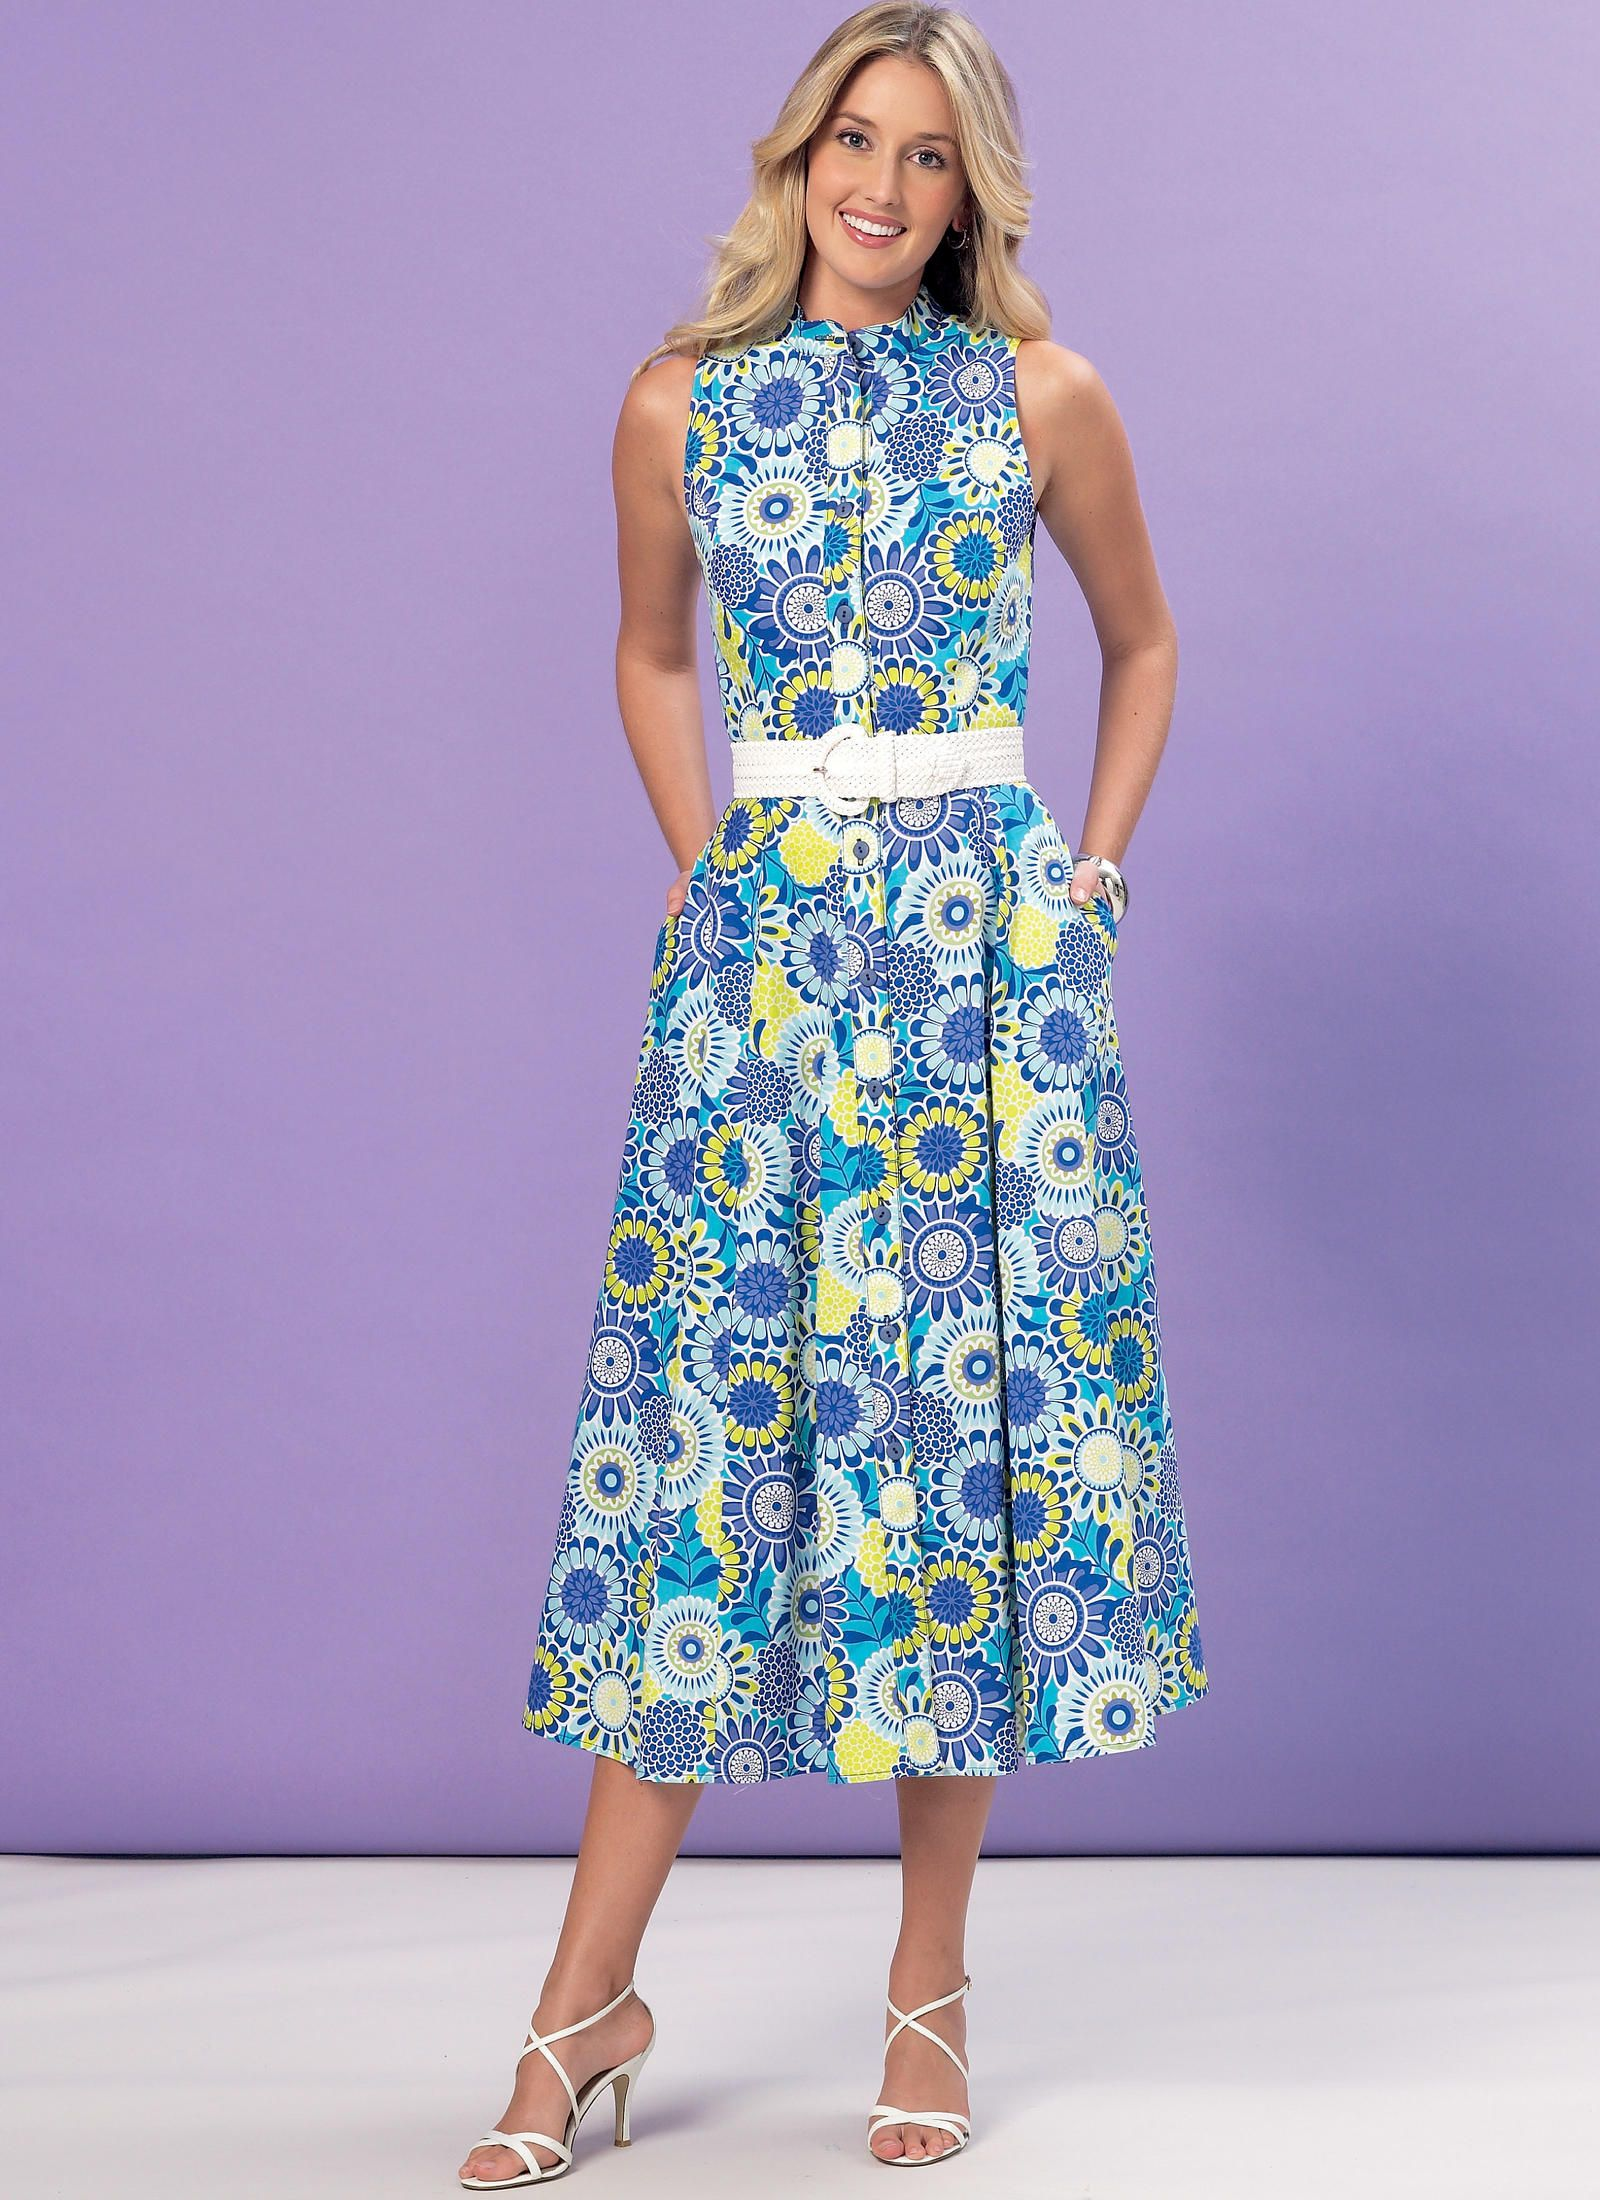 K4155 | Misses\' Shirtdresses Sewing Pattern | Kwik Sew Patterns ...